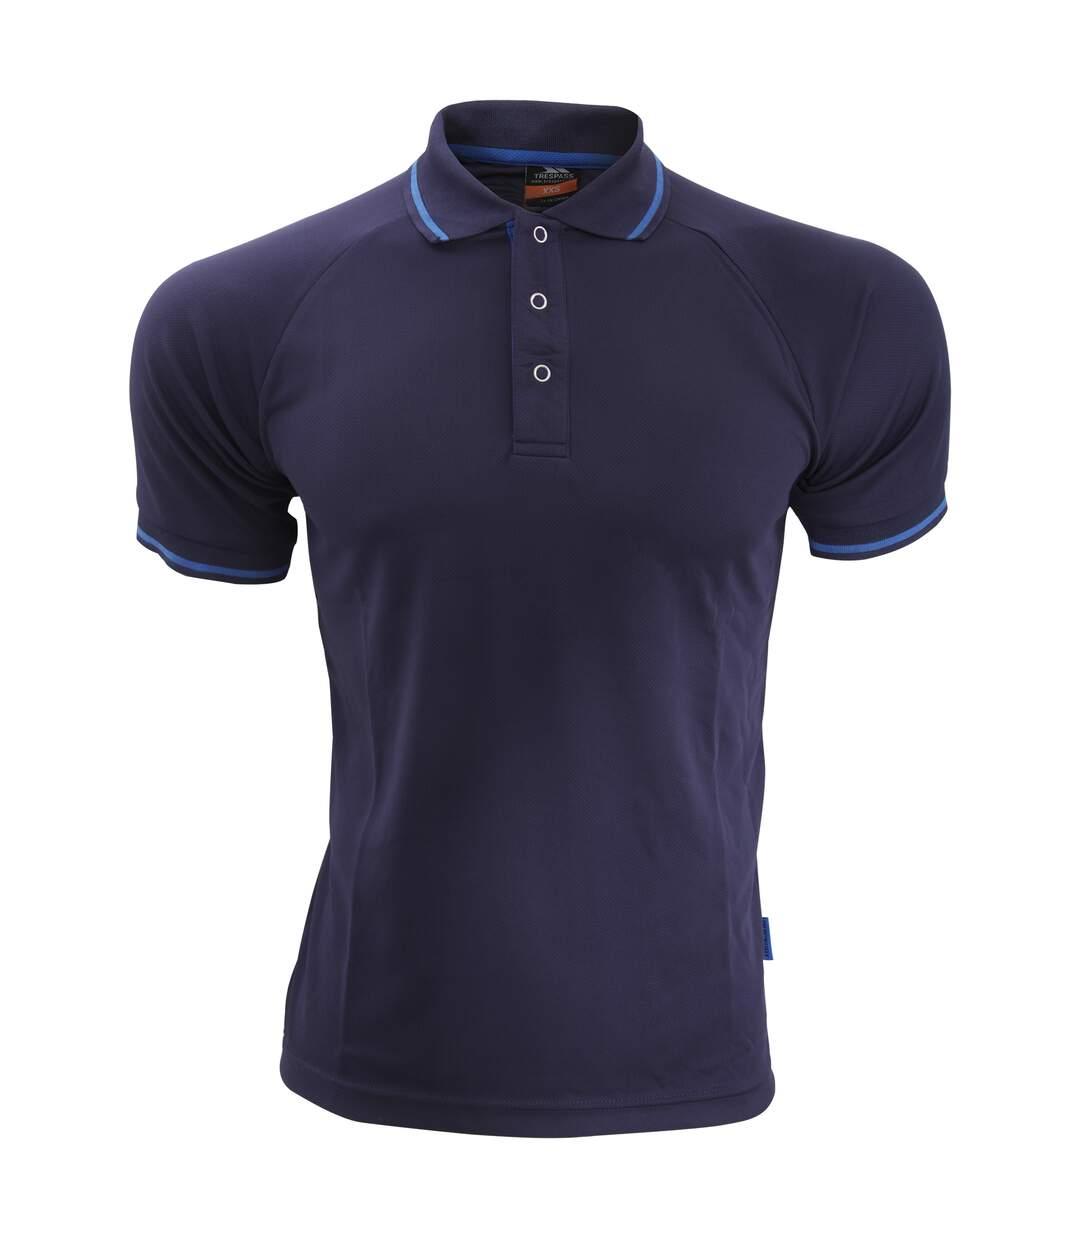 Trespass Mens Bonington Short Sleeve Active Polo Shirt (Airforce Blue) - UTTP2931